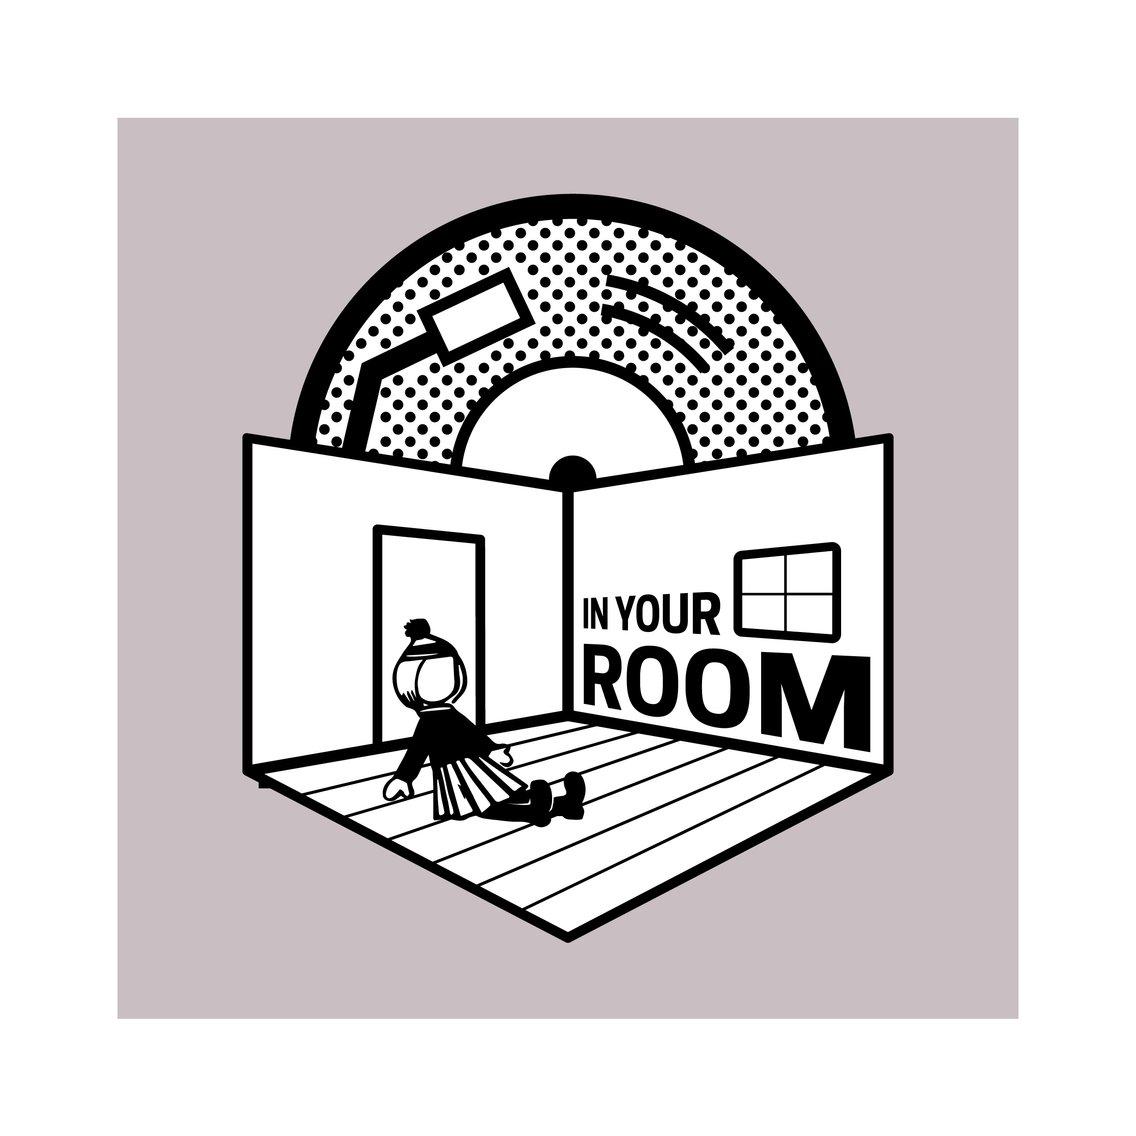 In Your Room - immagine di copertina